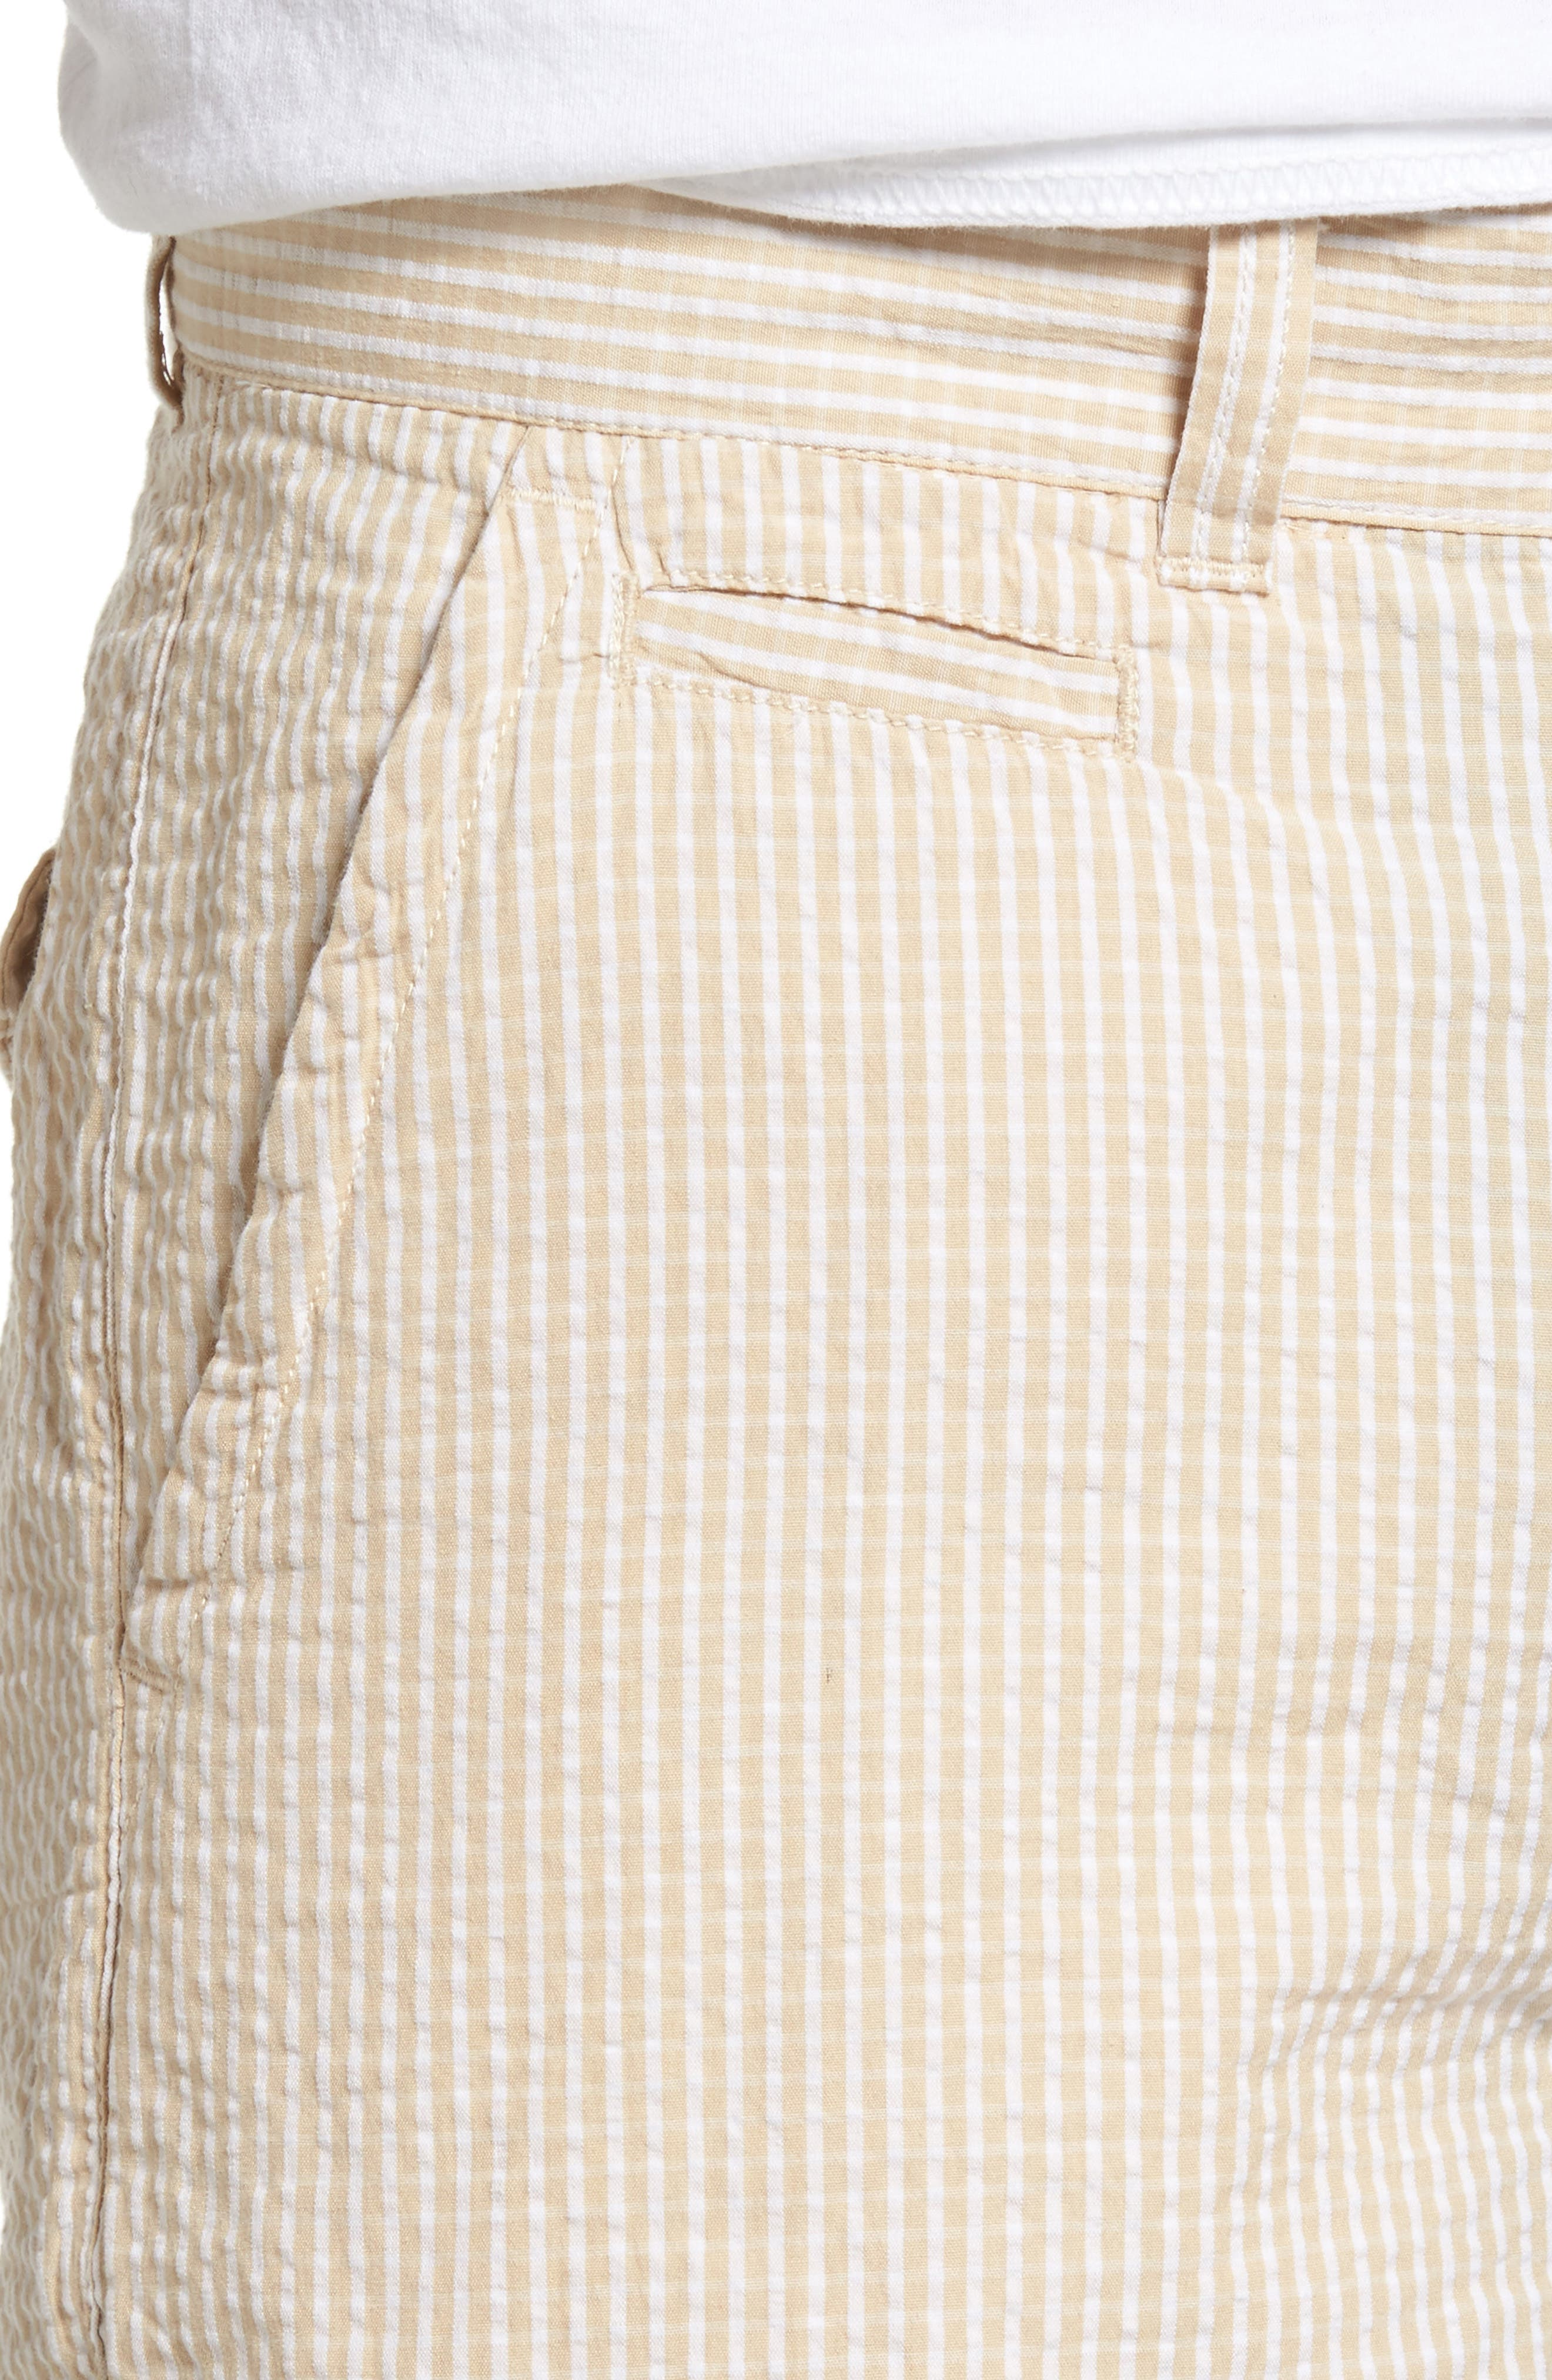 Stripe Seersucker Shorts,                             Alternate thumbnail 4, color,                             250